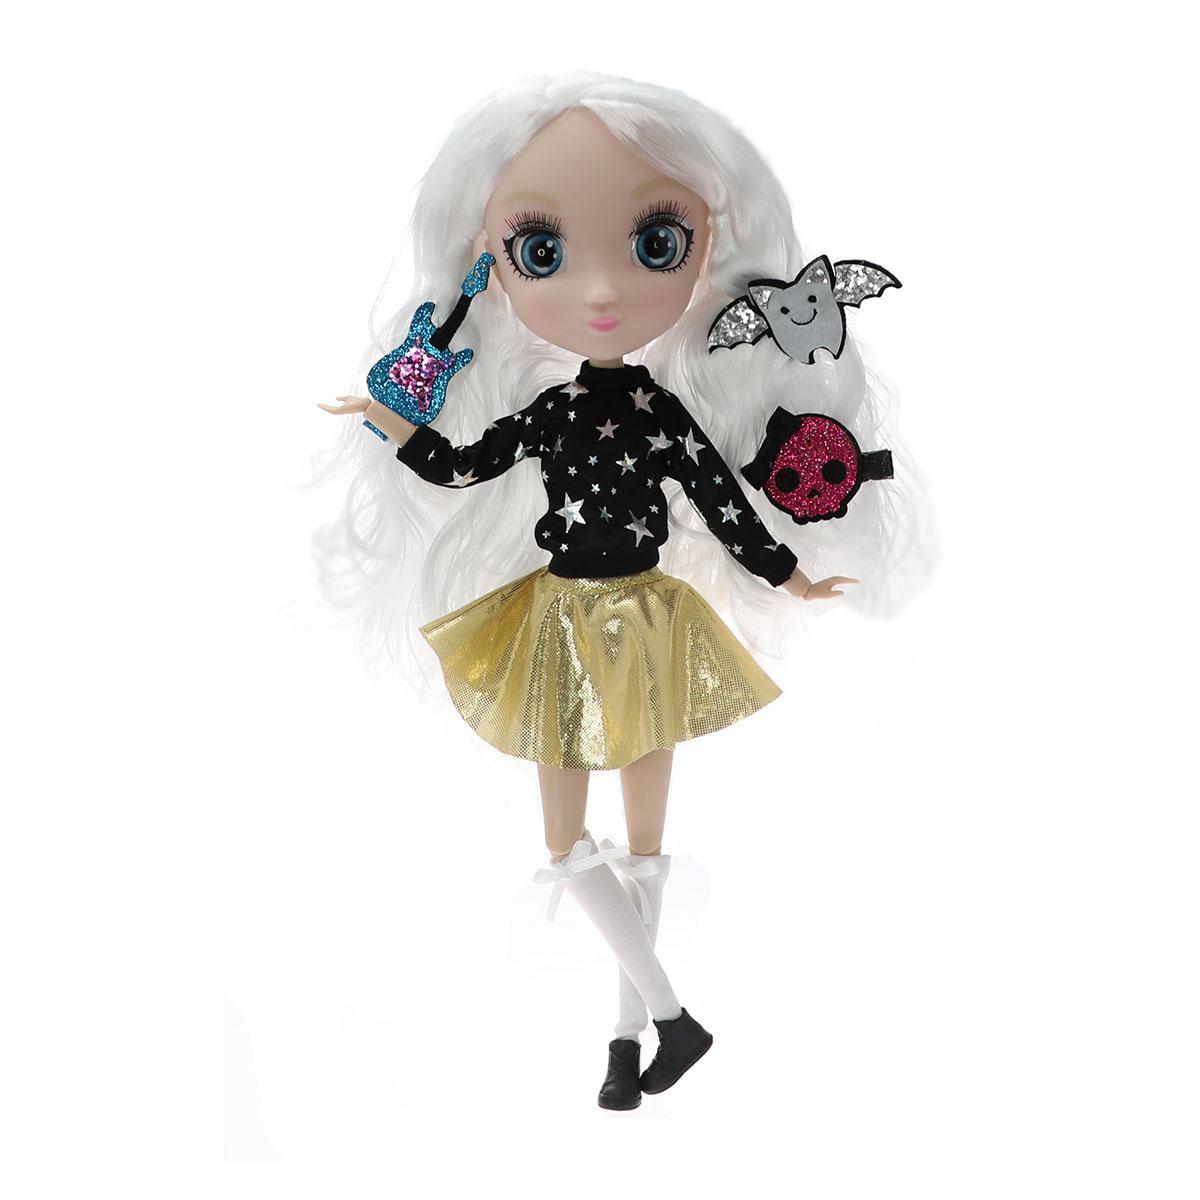 Кукла SHIBAJUKU S4 - ЙОКО Оригинал (33 cm, 6 точек артикуляции, с аксессуарами)